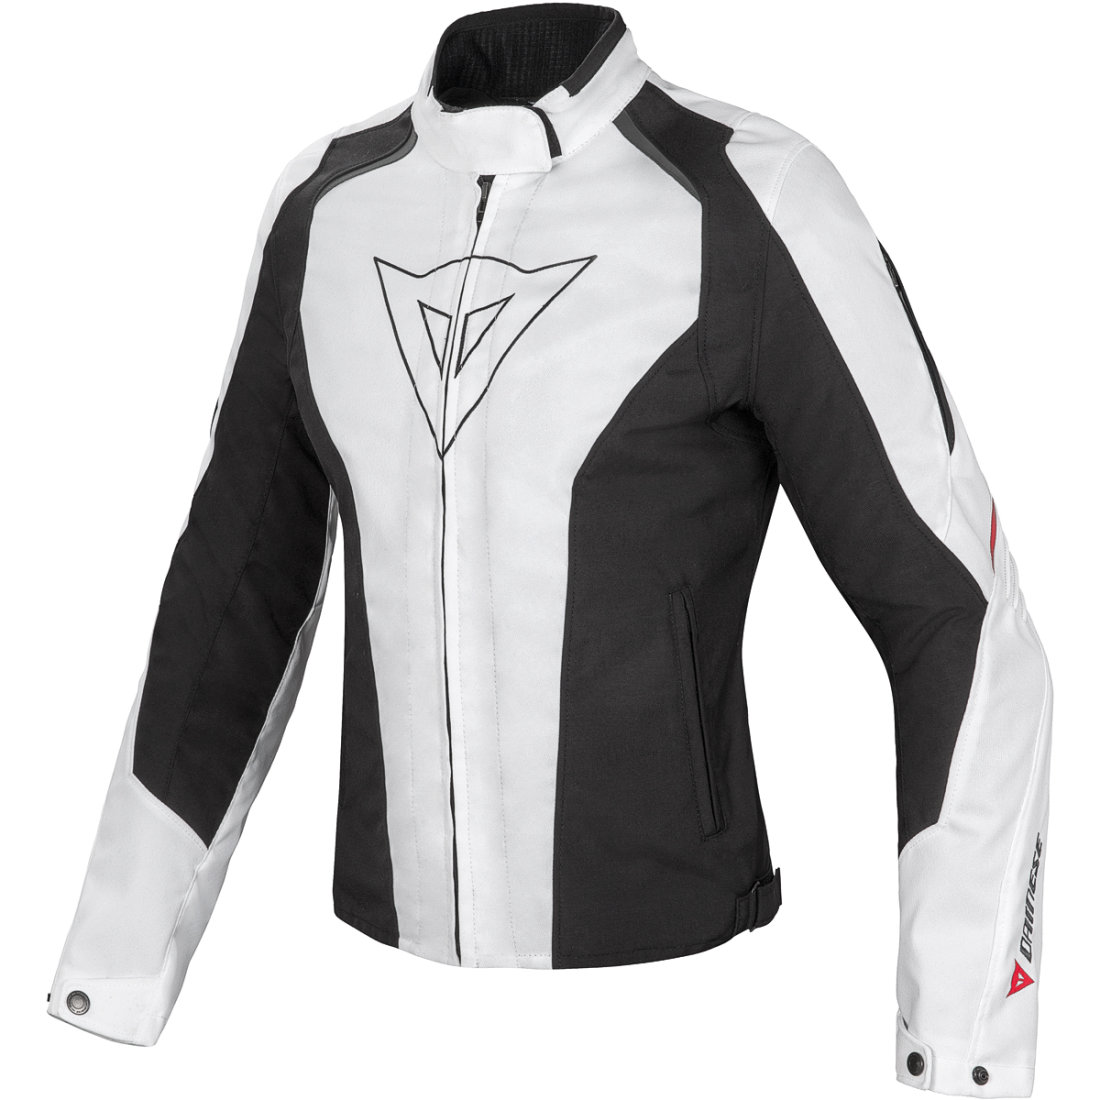 c4c5d6fb3f5 DAINESE Laguna Seca D-Dry Lady White   Black   Red Jacket · Motocard